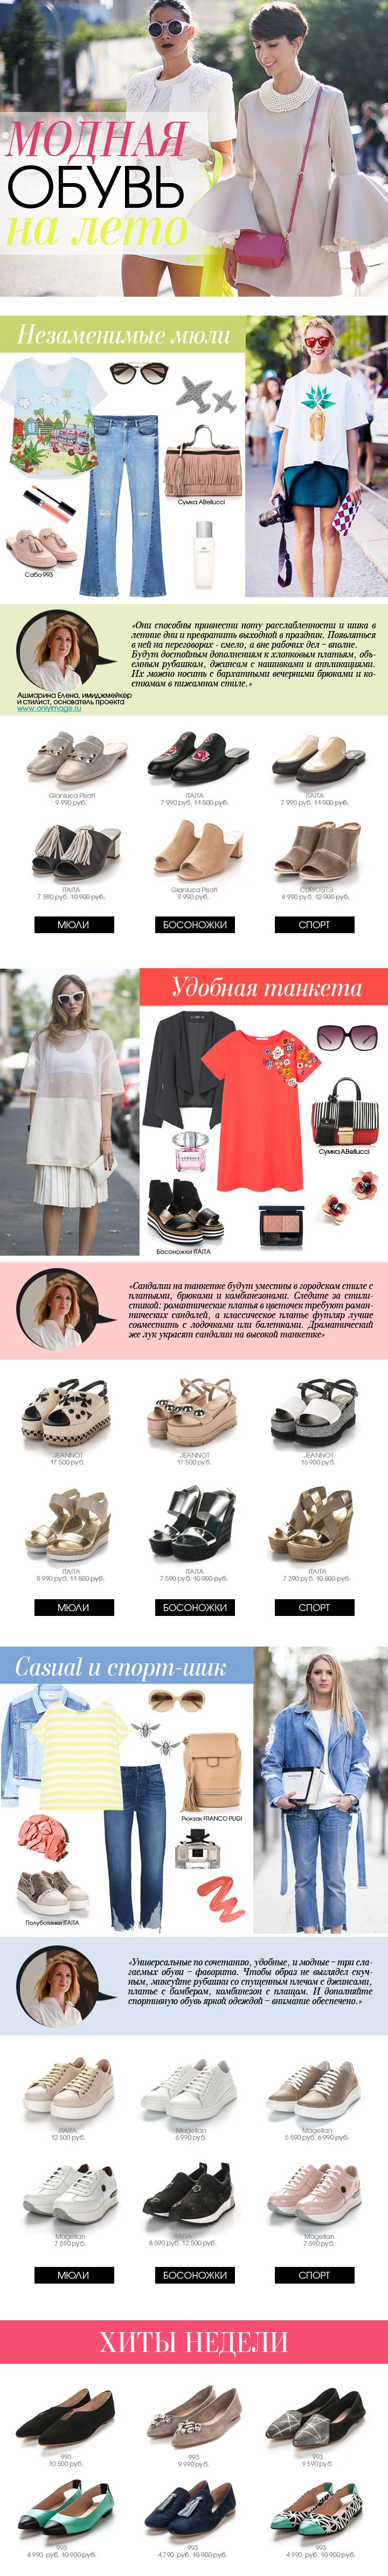 30-05-17-fashionboots.jpg